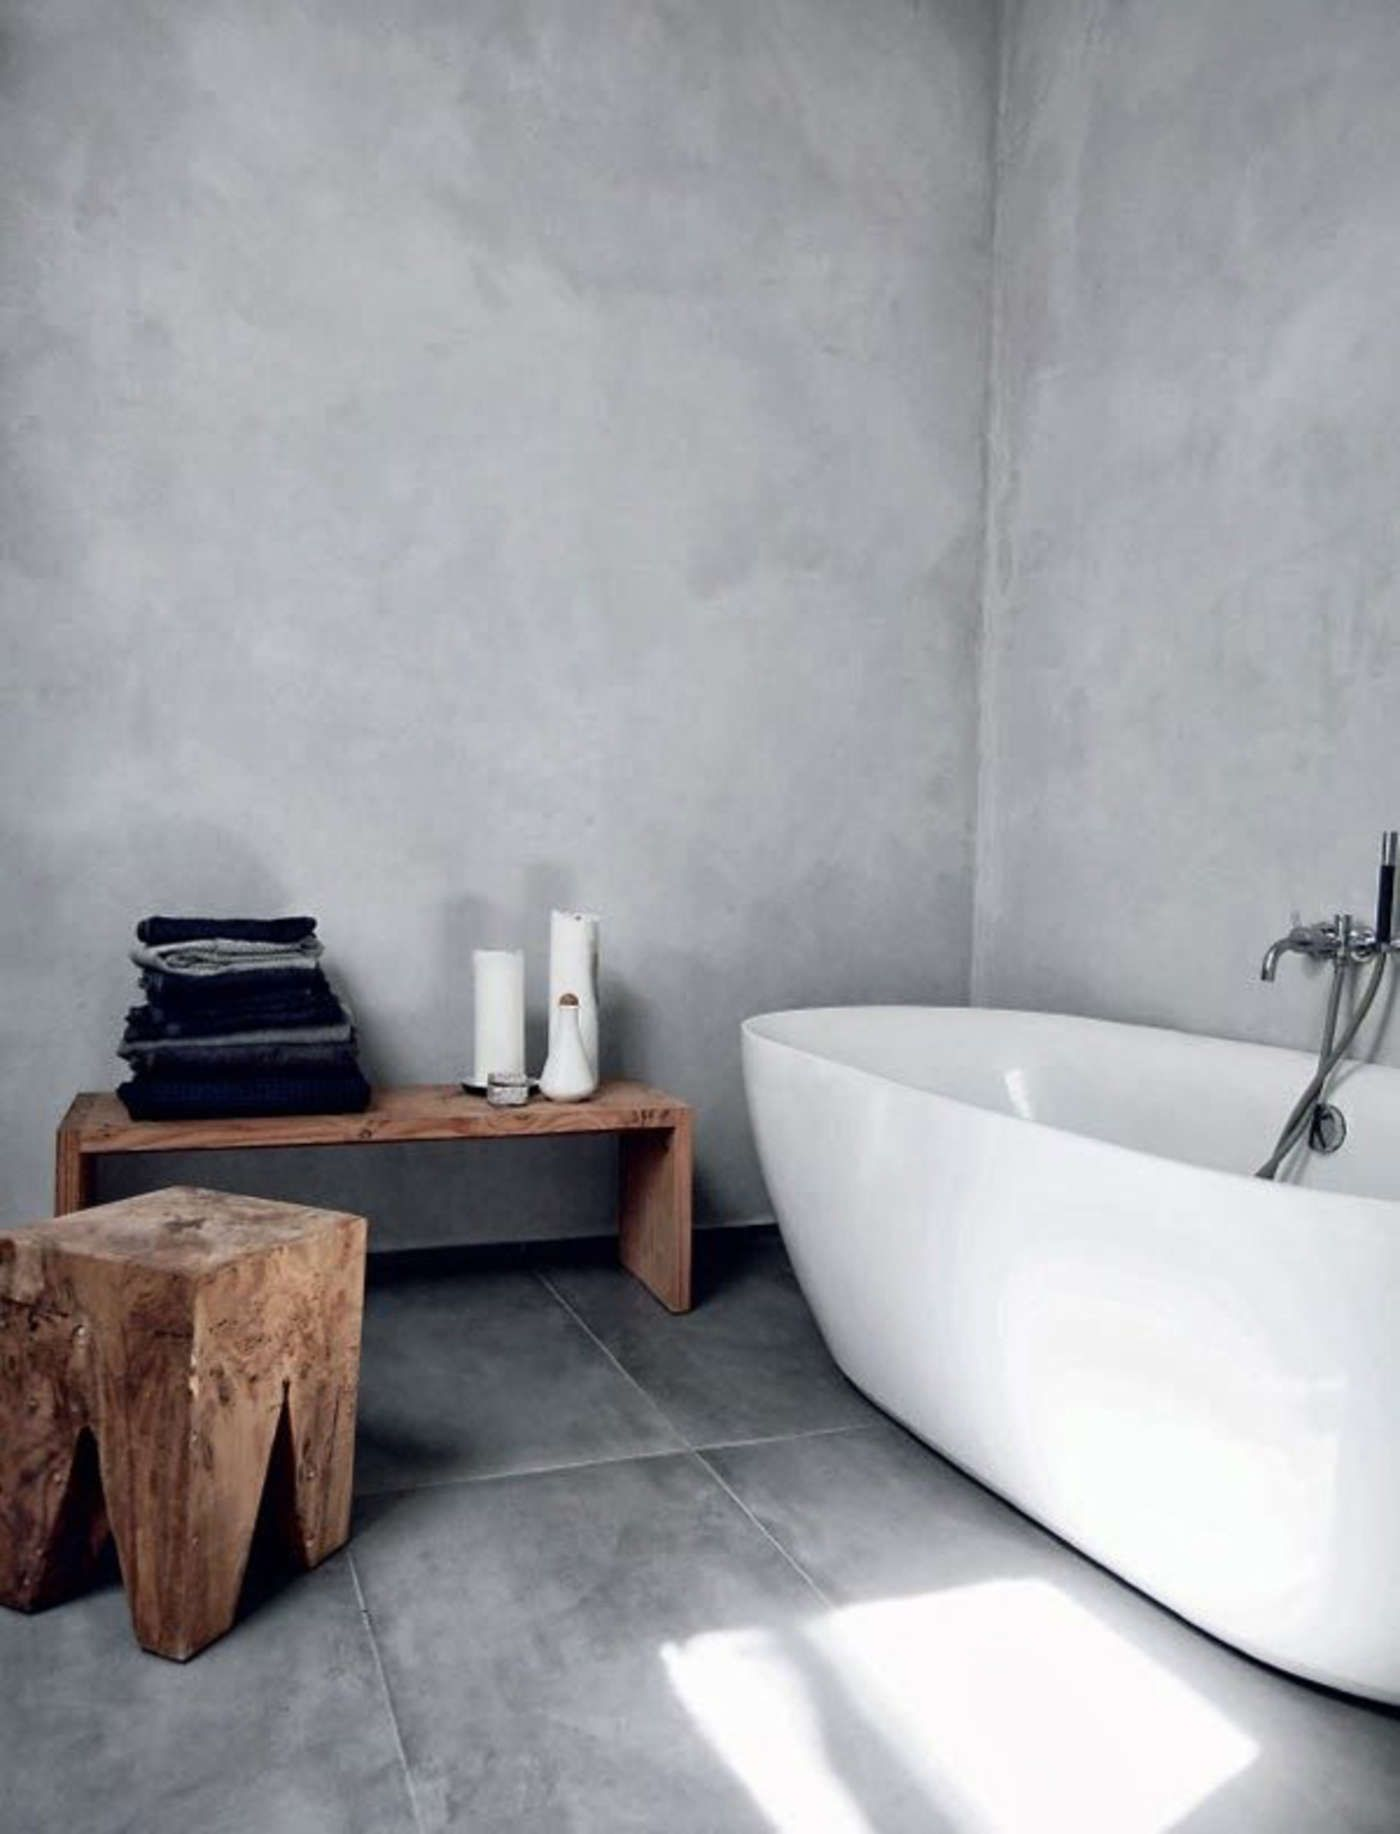 Trends Shaker Concrete Bathroom Baignoire Sur Pied Salle De Bain En Beton Salle De Bain Minimaliste